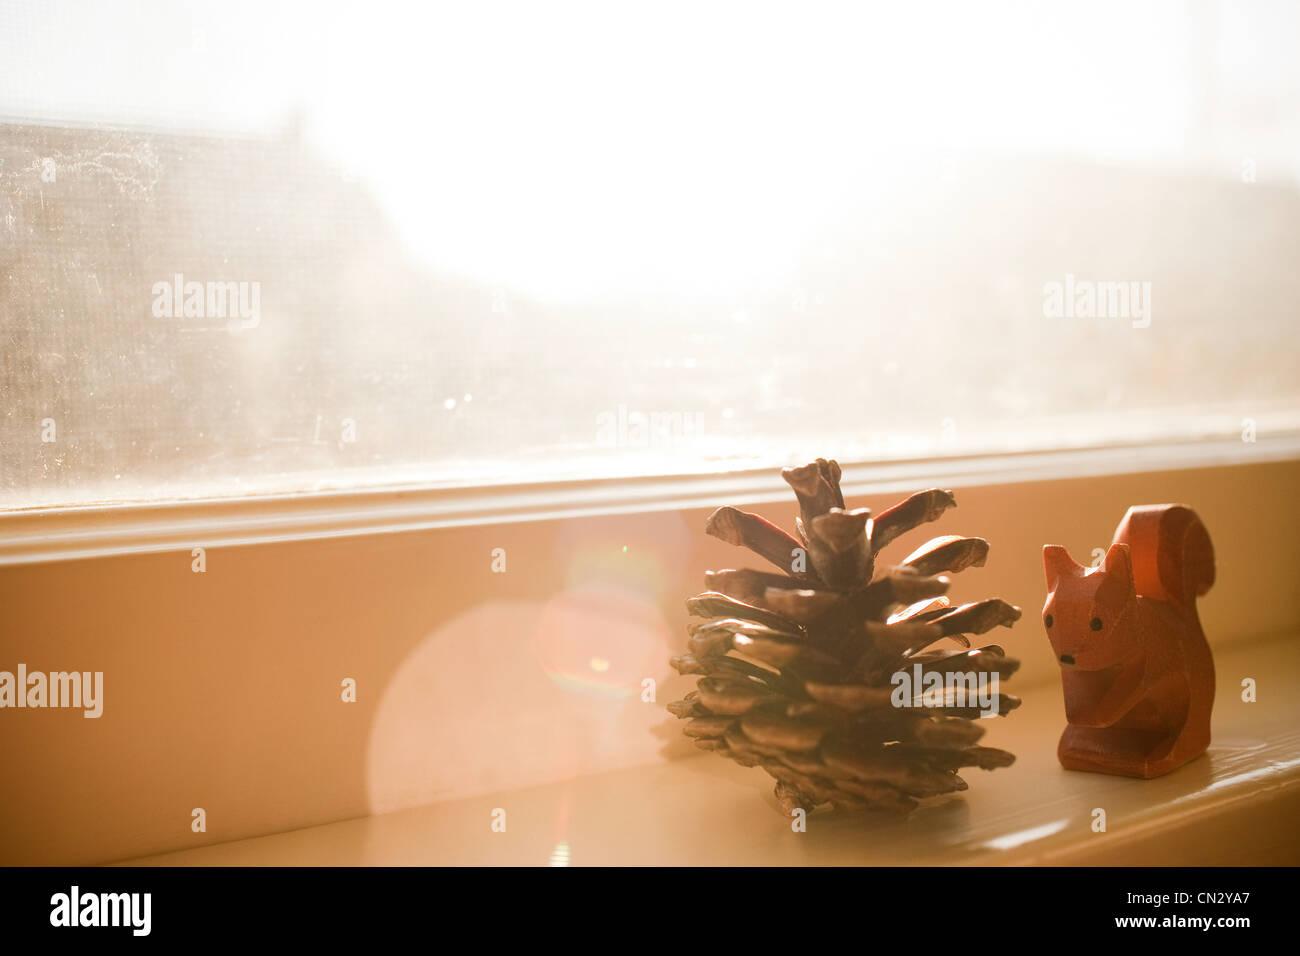 Pine cone and squirrel ornament on windowsill - Stock Image